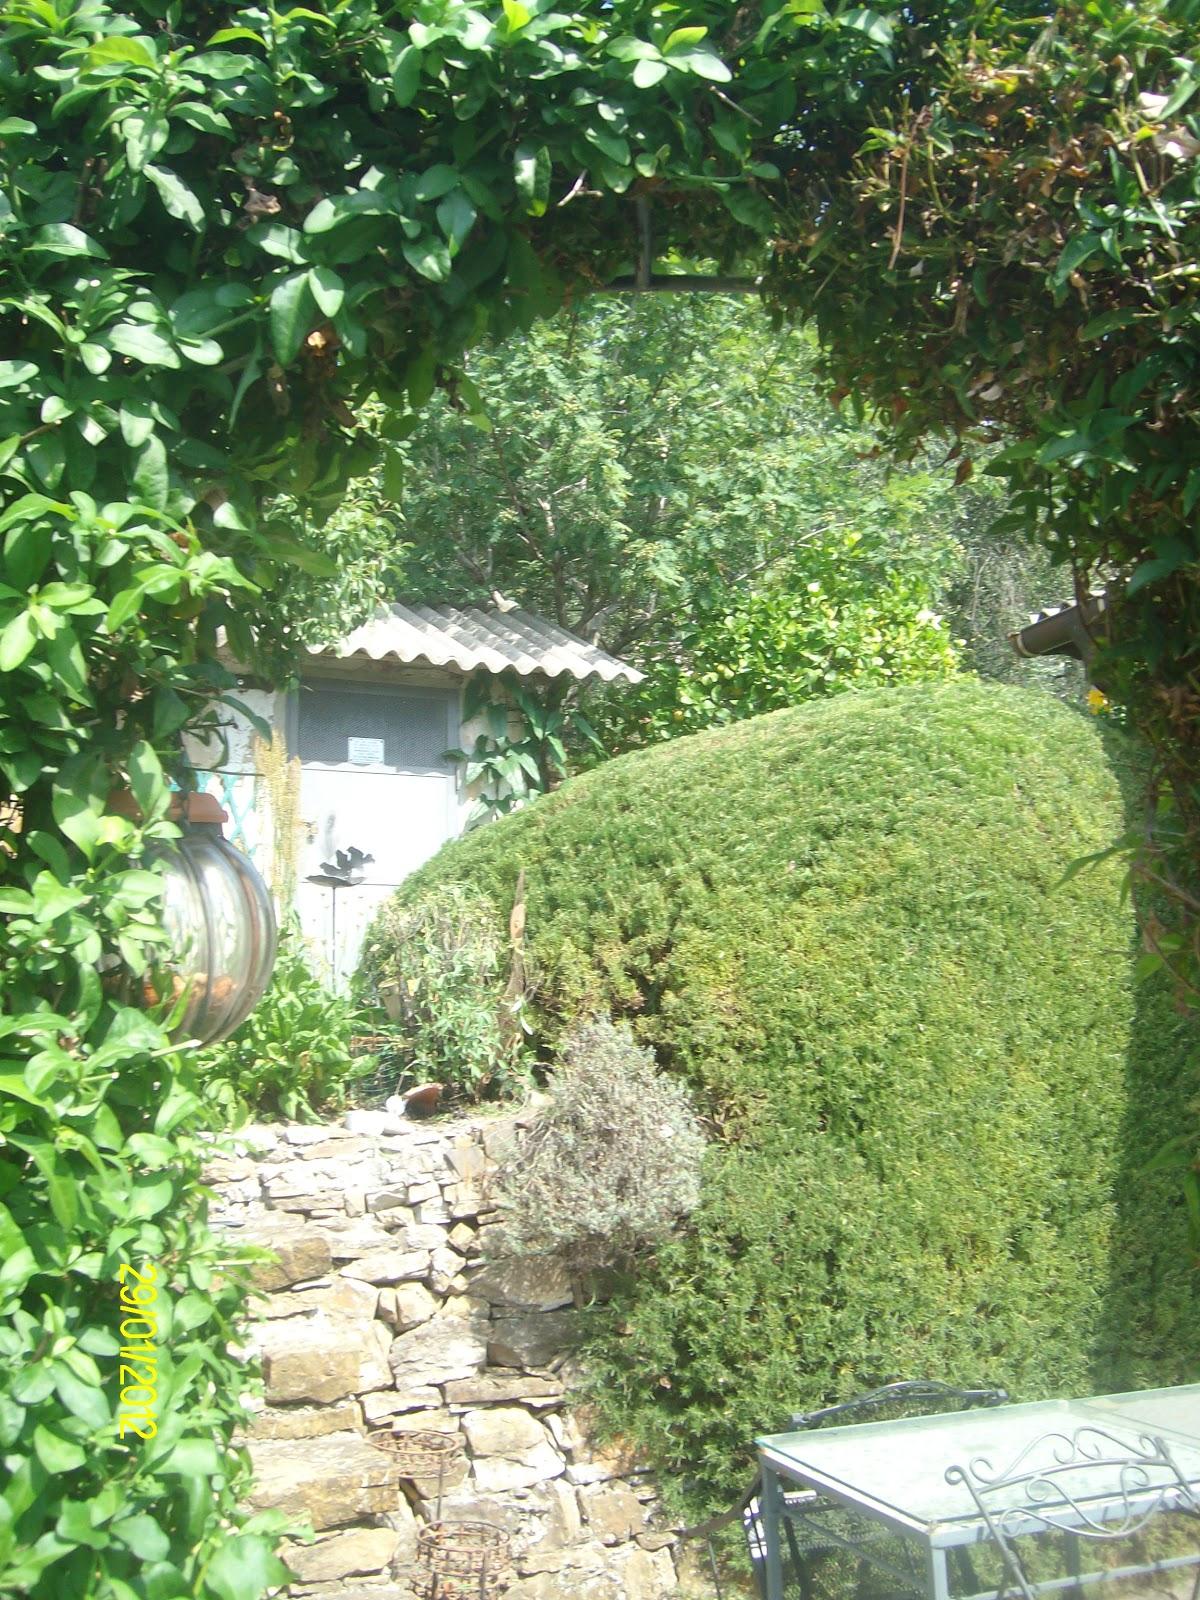 Bruno splendido giardiniere - Giardini curati ...